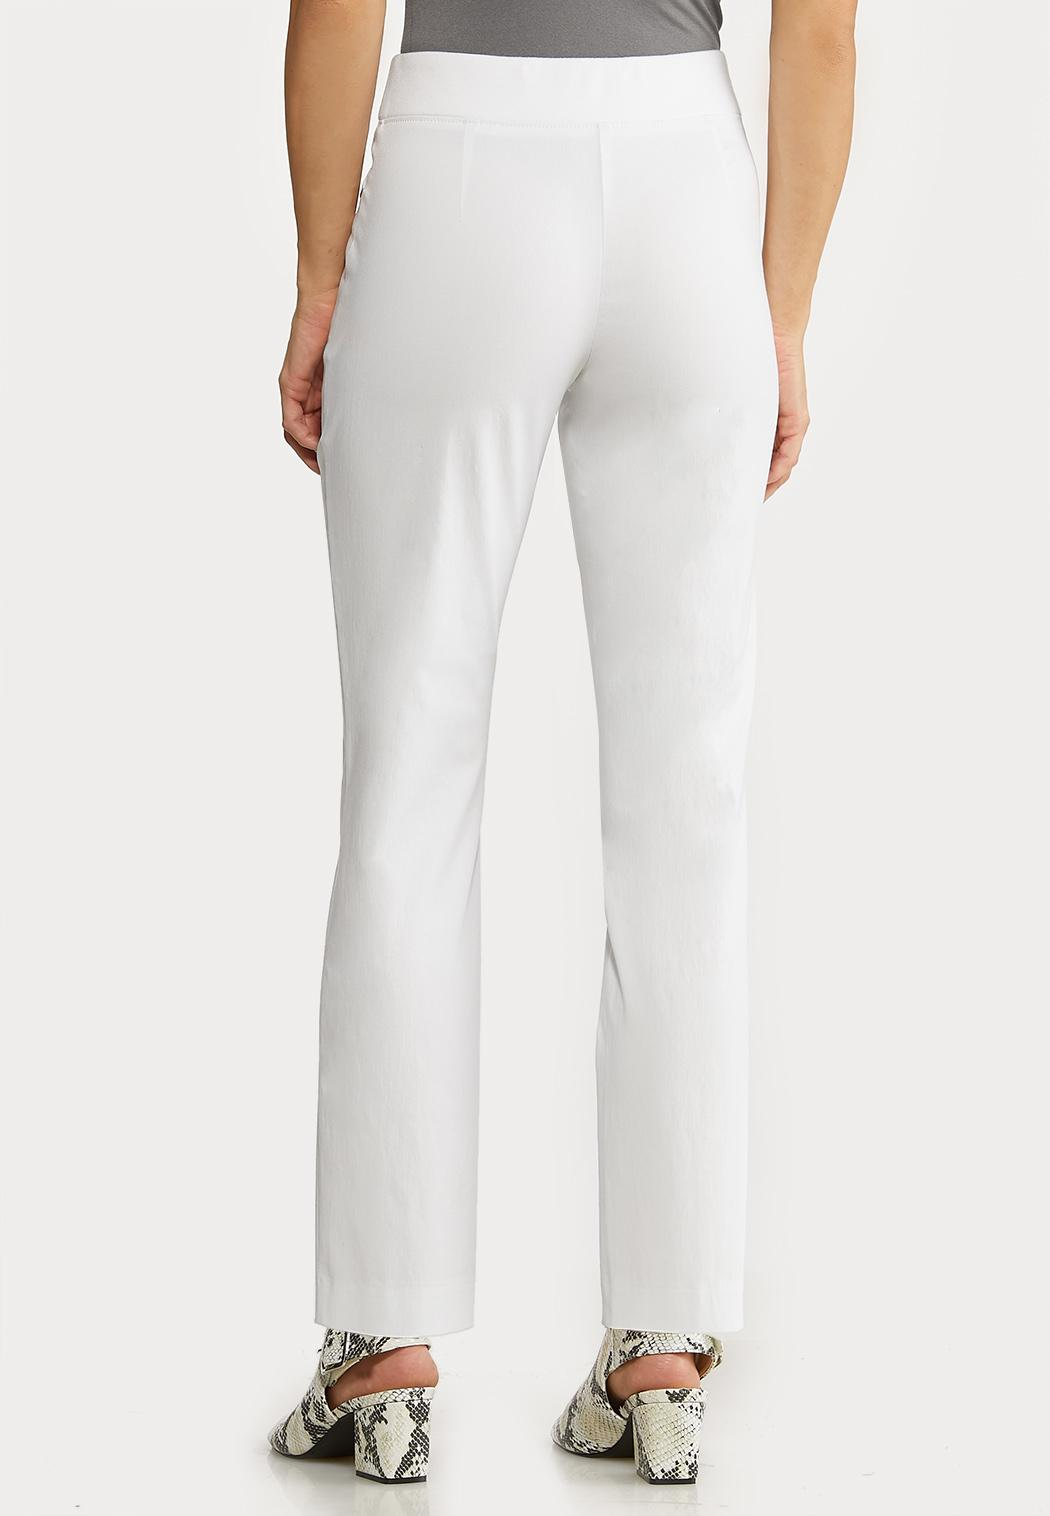 White Bengaline Ankle Pants (Item #44127455)